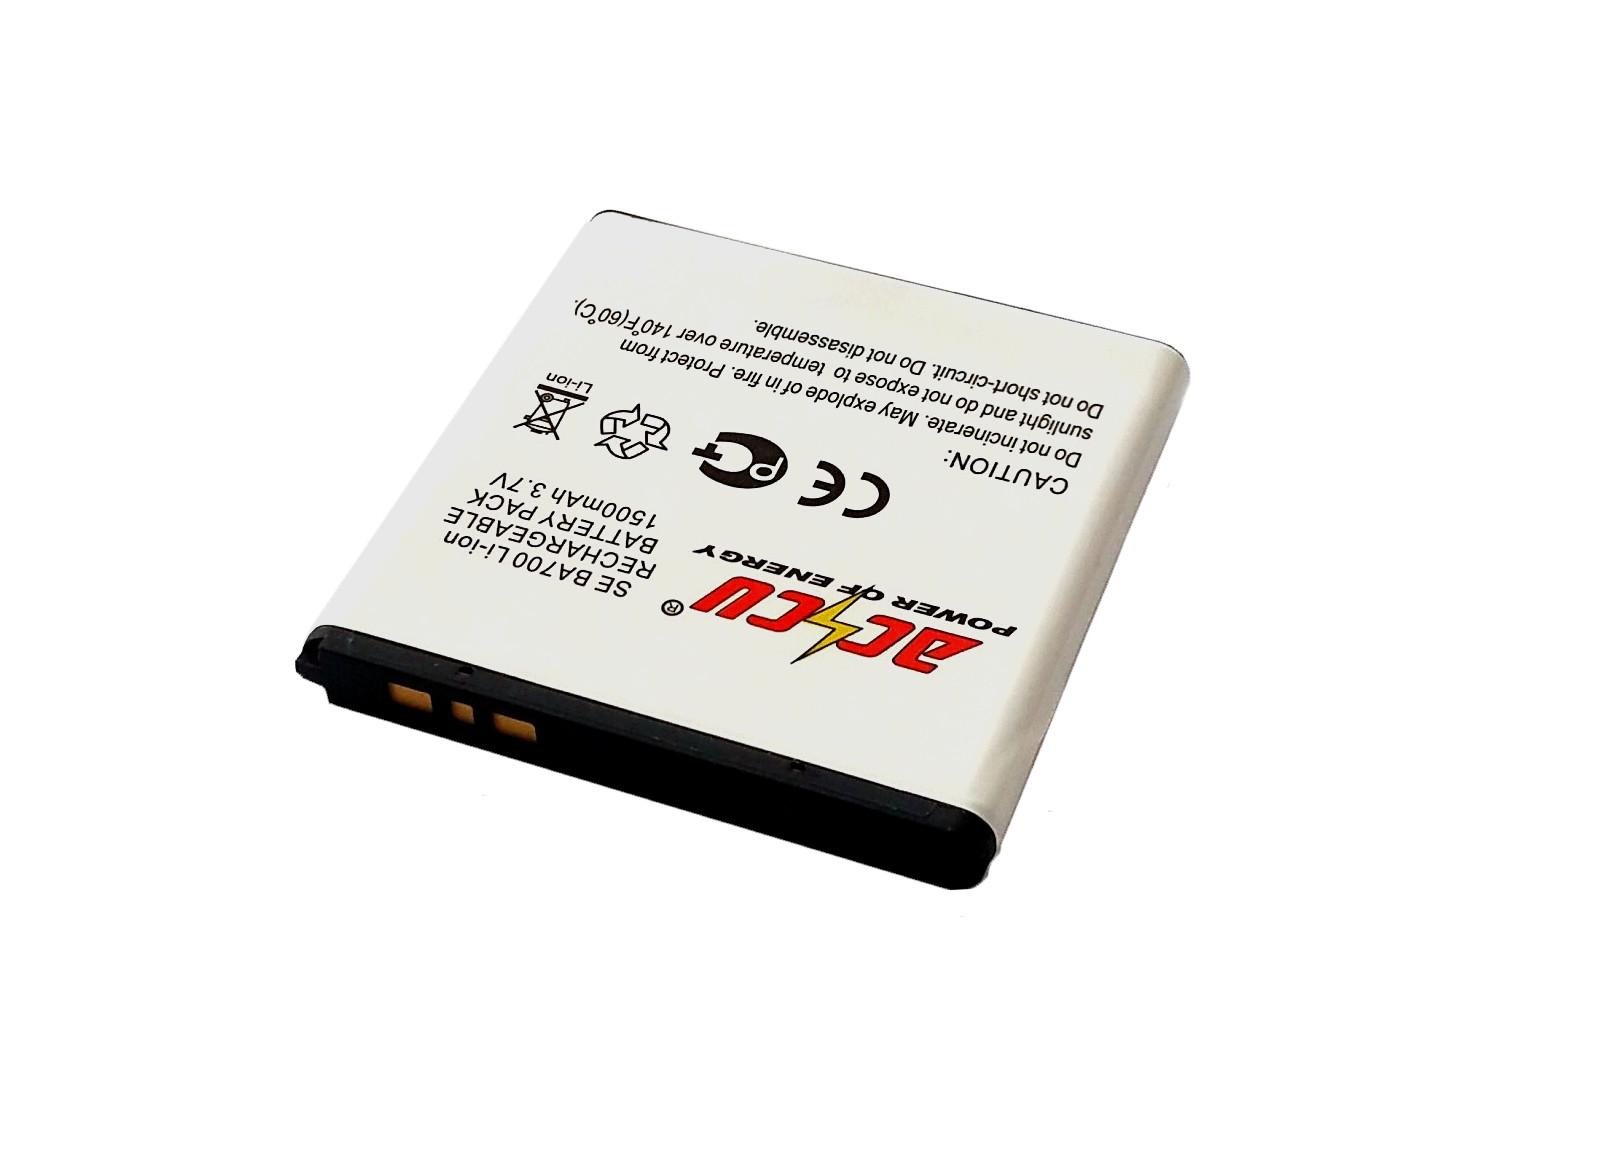 Baterie Accu pro Sony Ericsson Xperia Ray, Neo, Miro, Pro,Tipo, Li-ion, 1500mAh